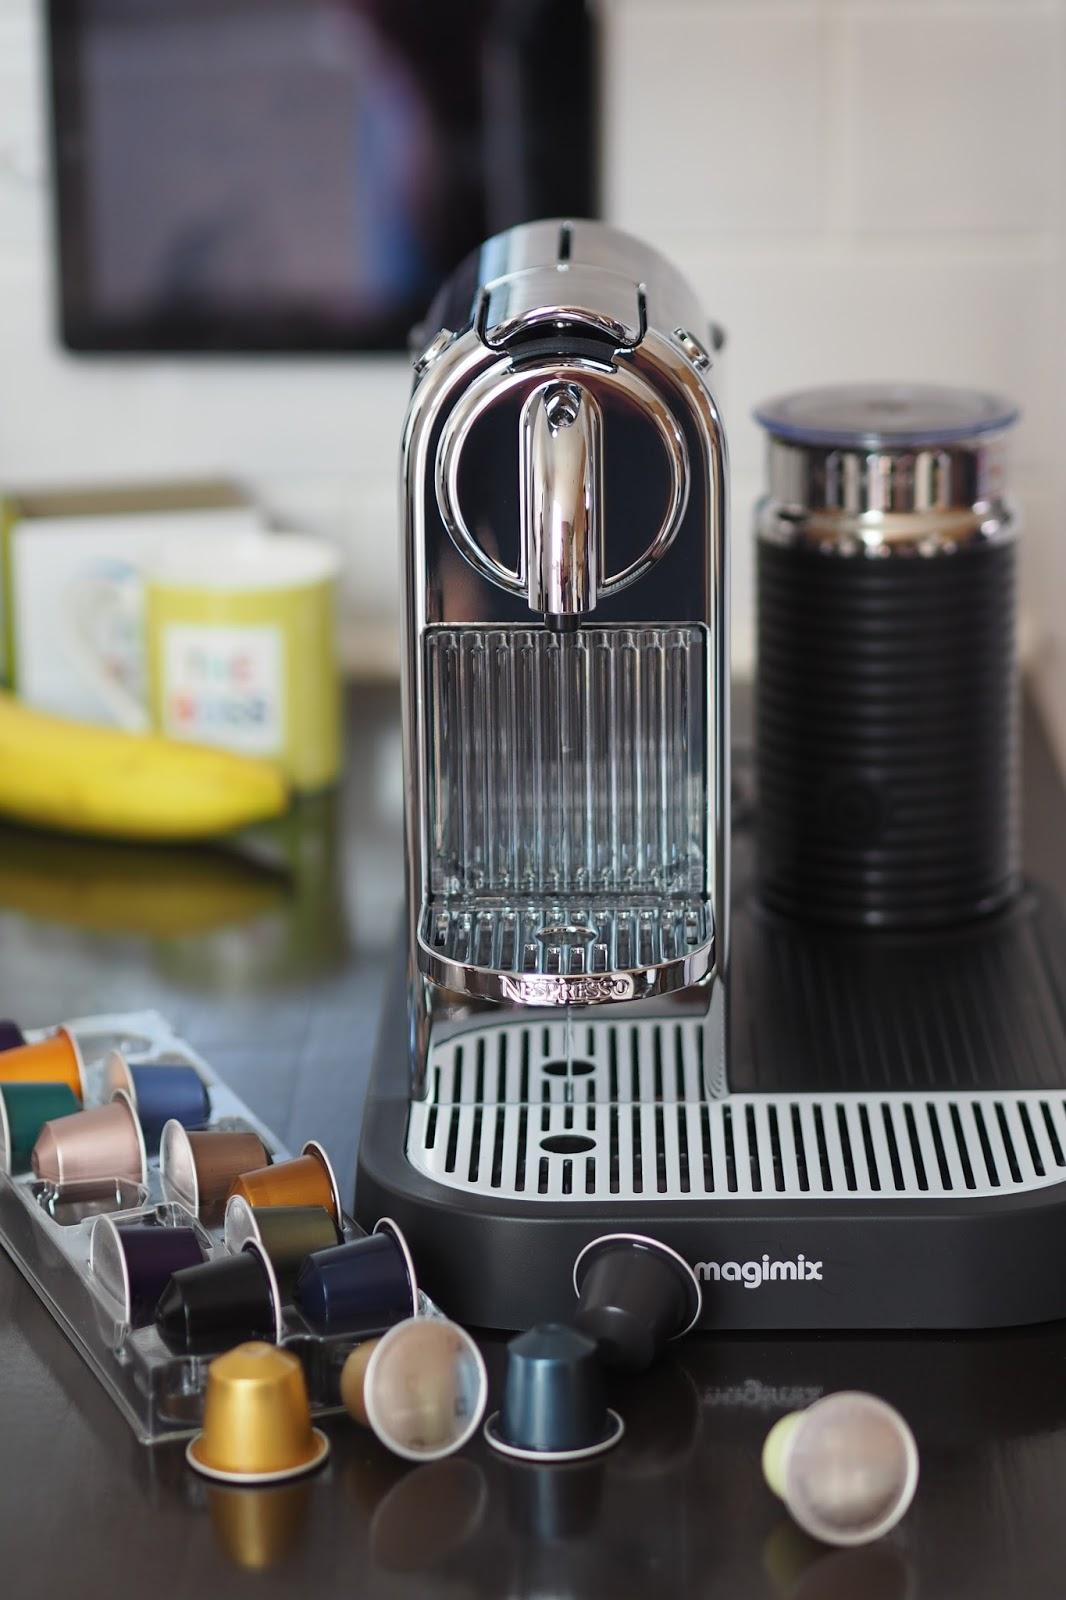 Magimix Nespresso Citiz